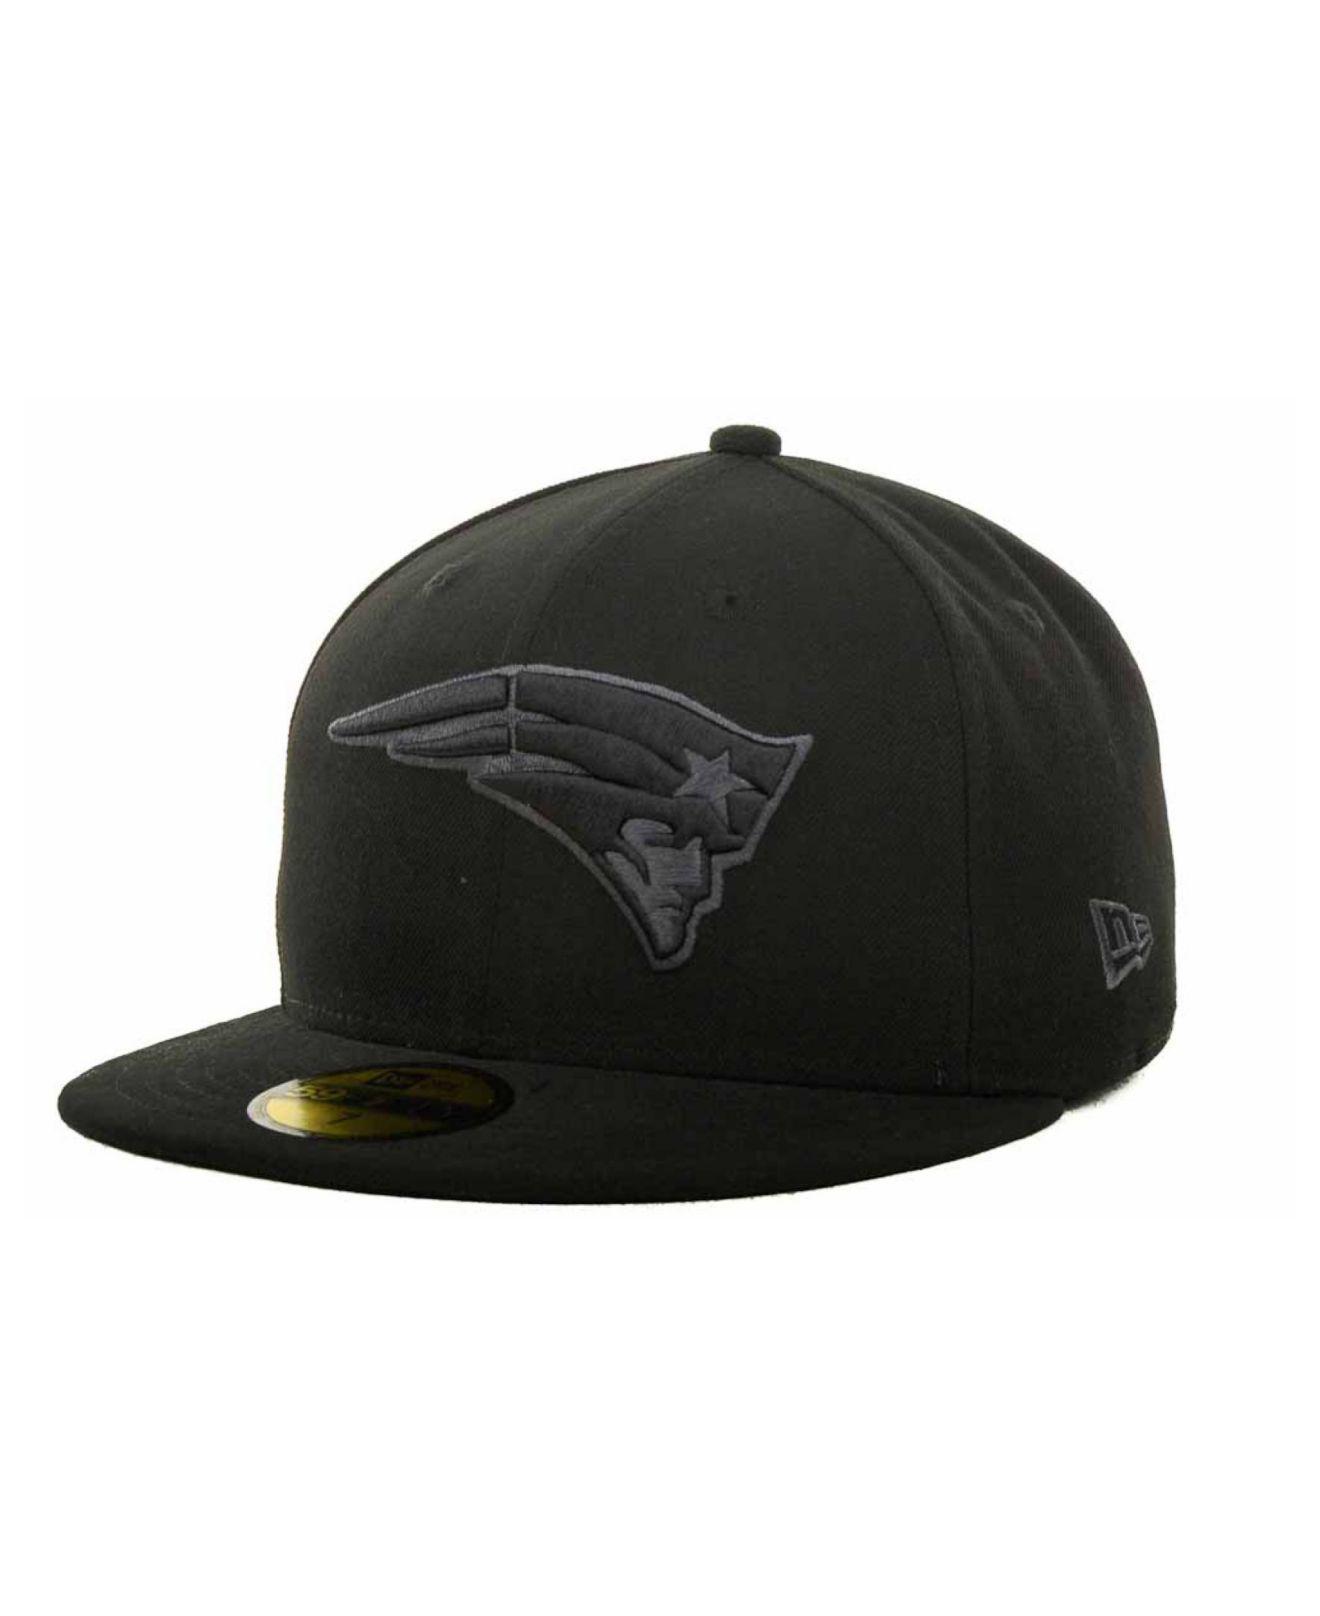 quality design 5ff2b b8195 KTZ. Men s Oakland Raiders Black Gray 59fifty Cap